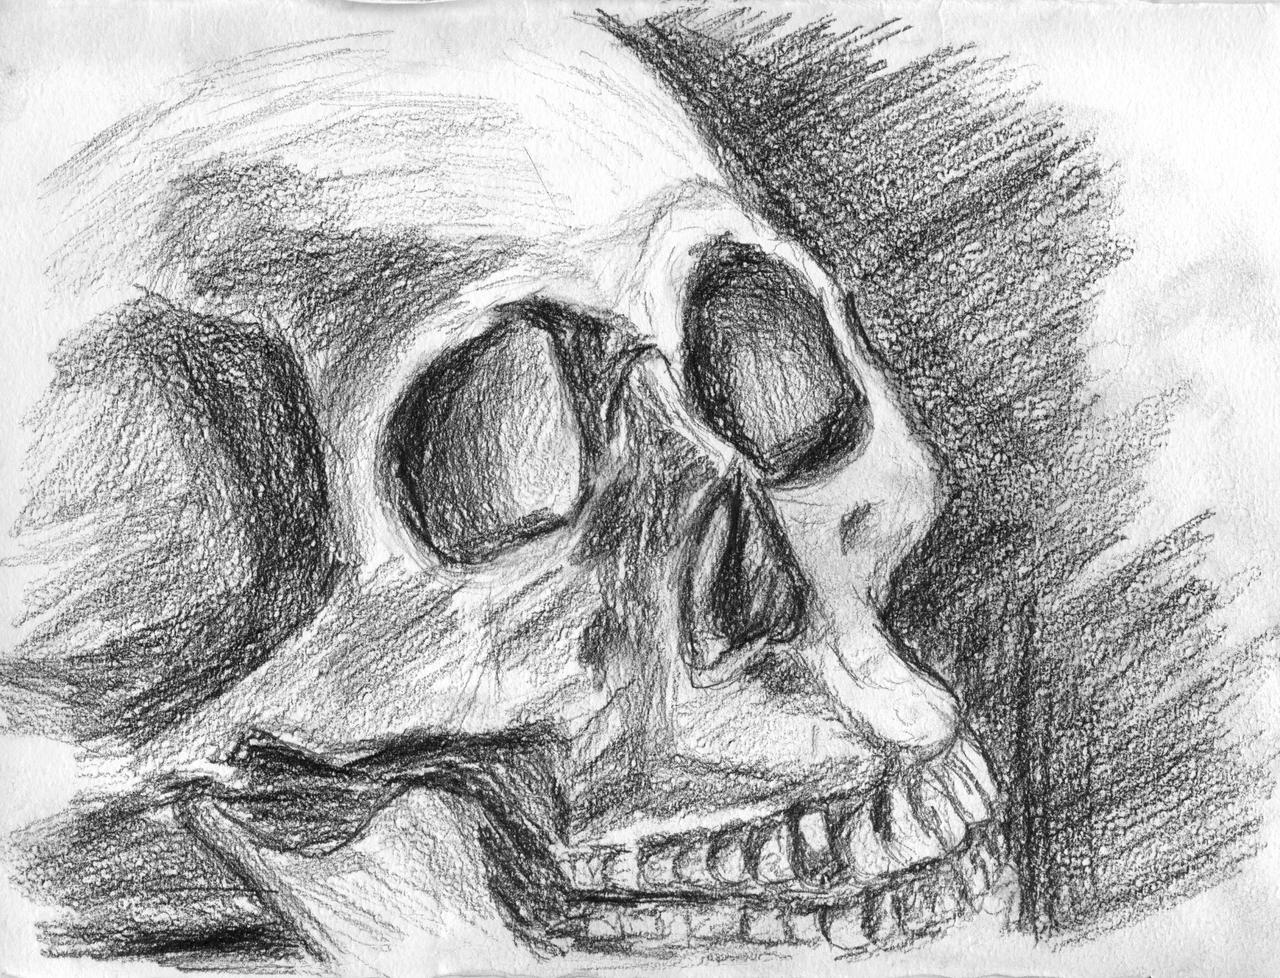 skull sketch (black pencil)